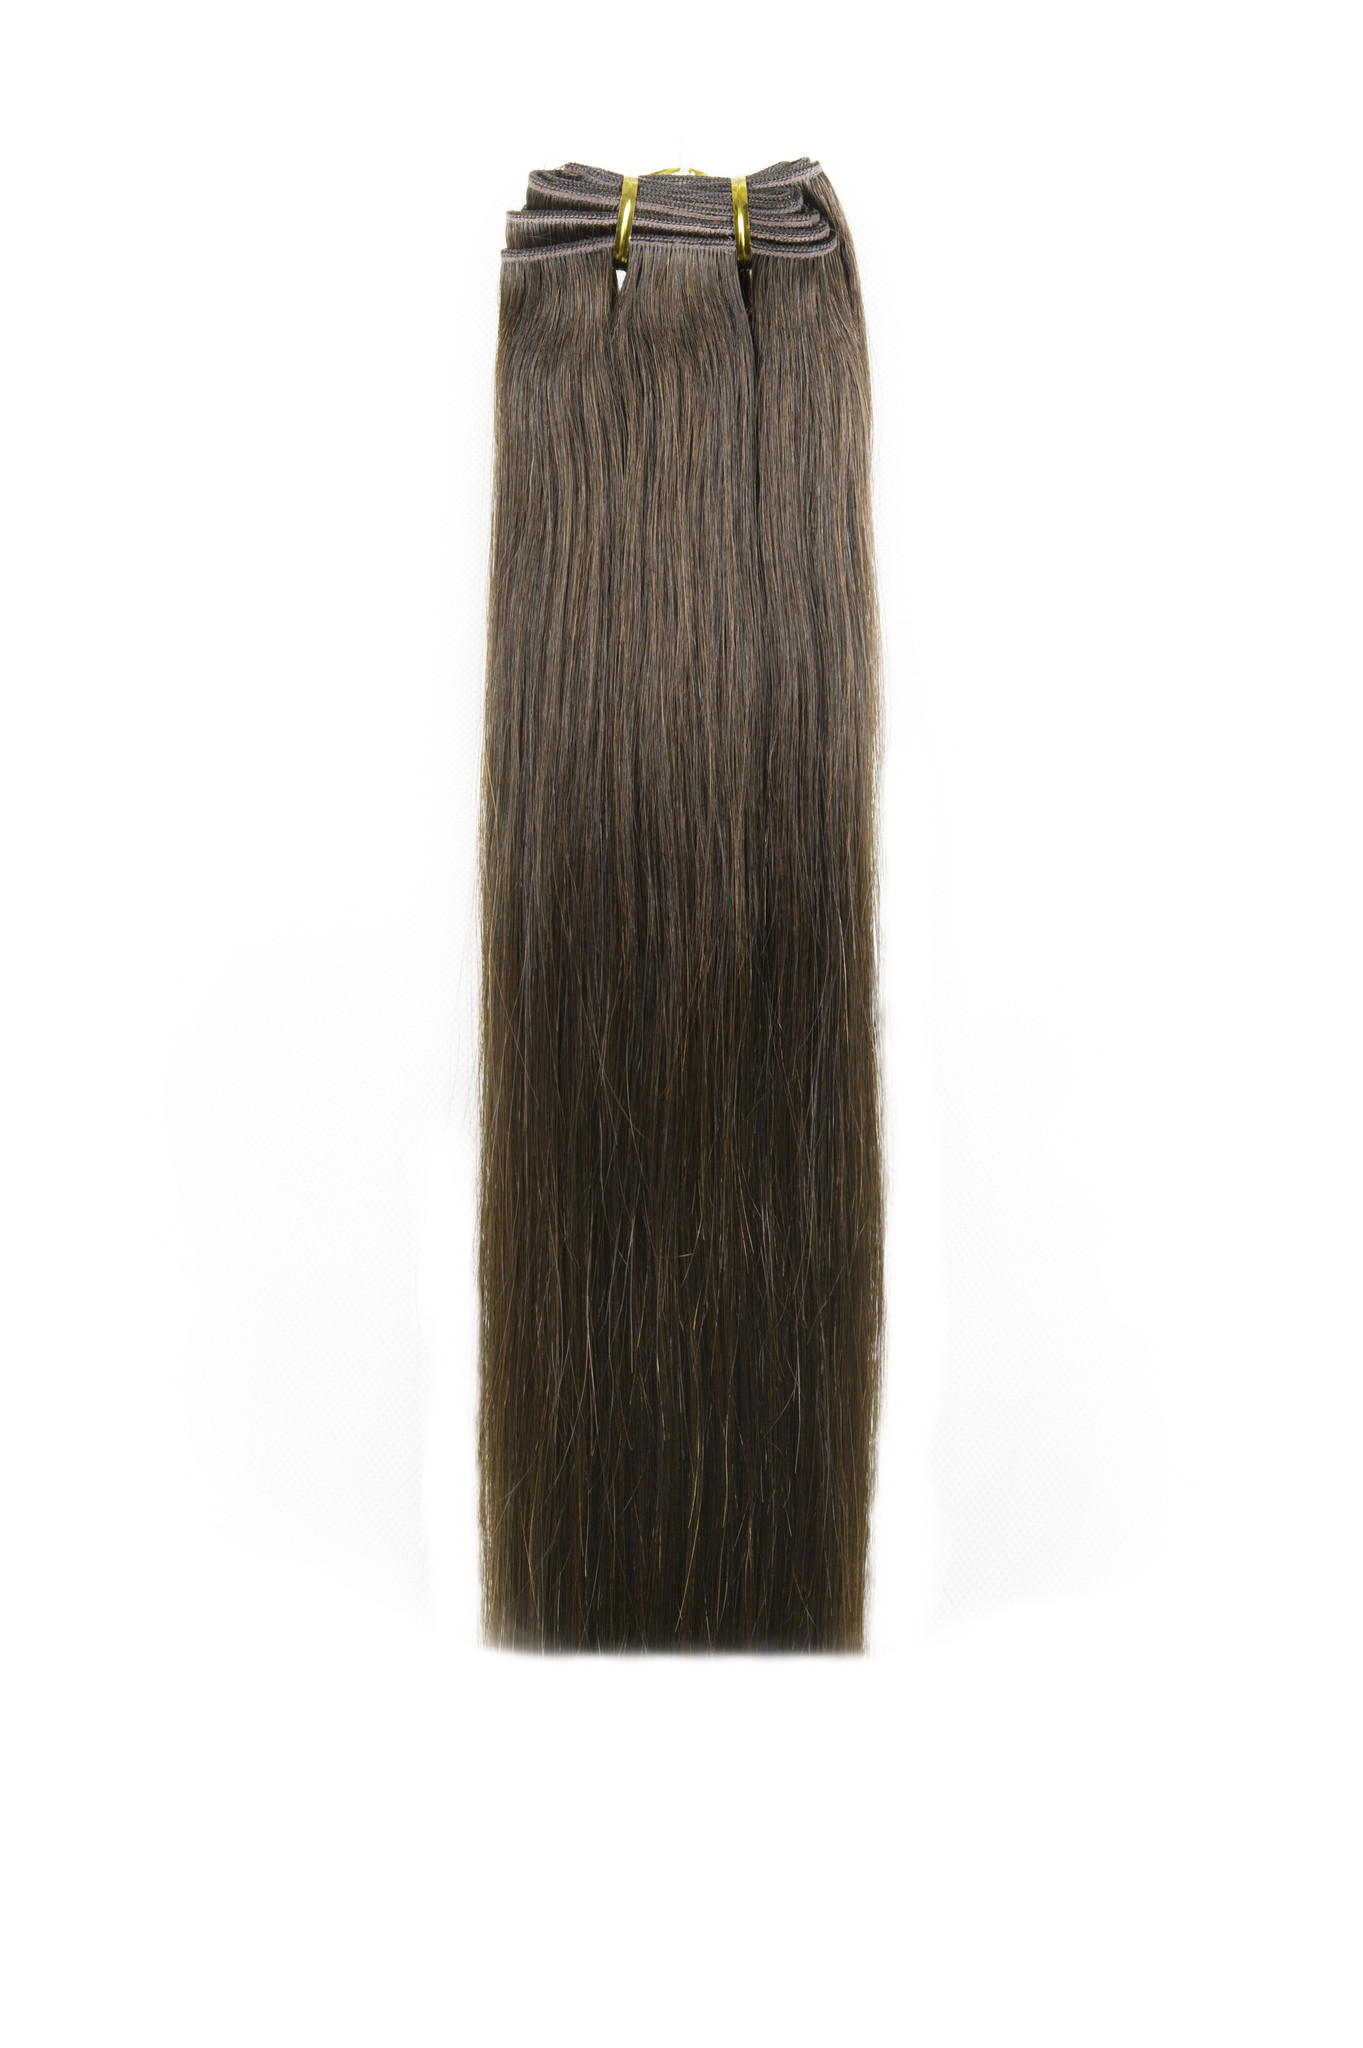 SilverFox Weave - #2- Deep Dark Brown